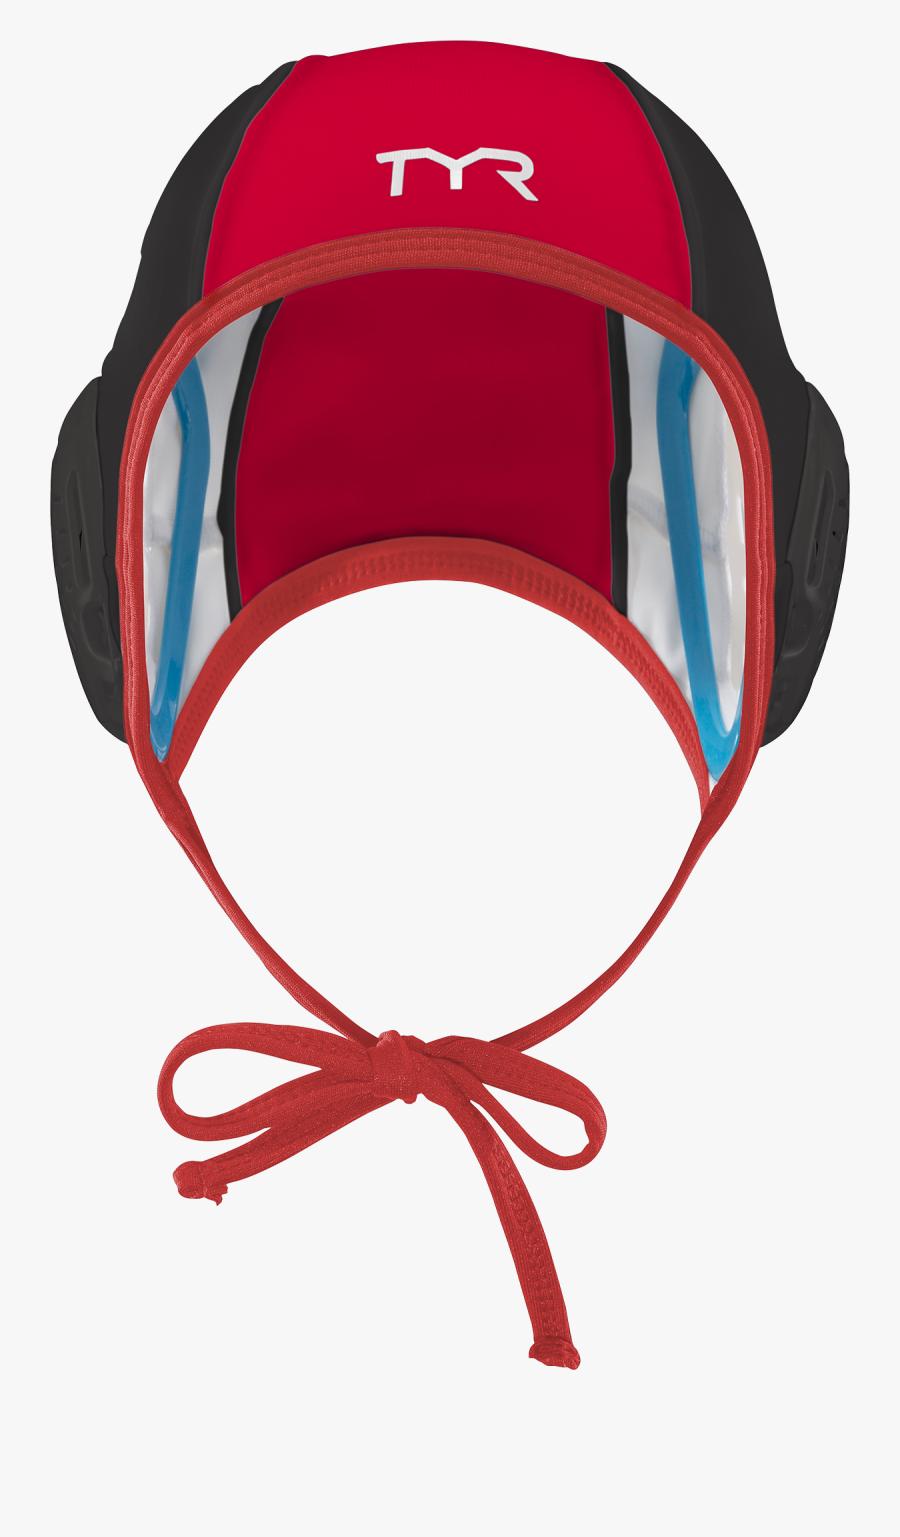 Destroyer Water Polo Goalie - Water Polo Goalie Cap, Transparent Clipart